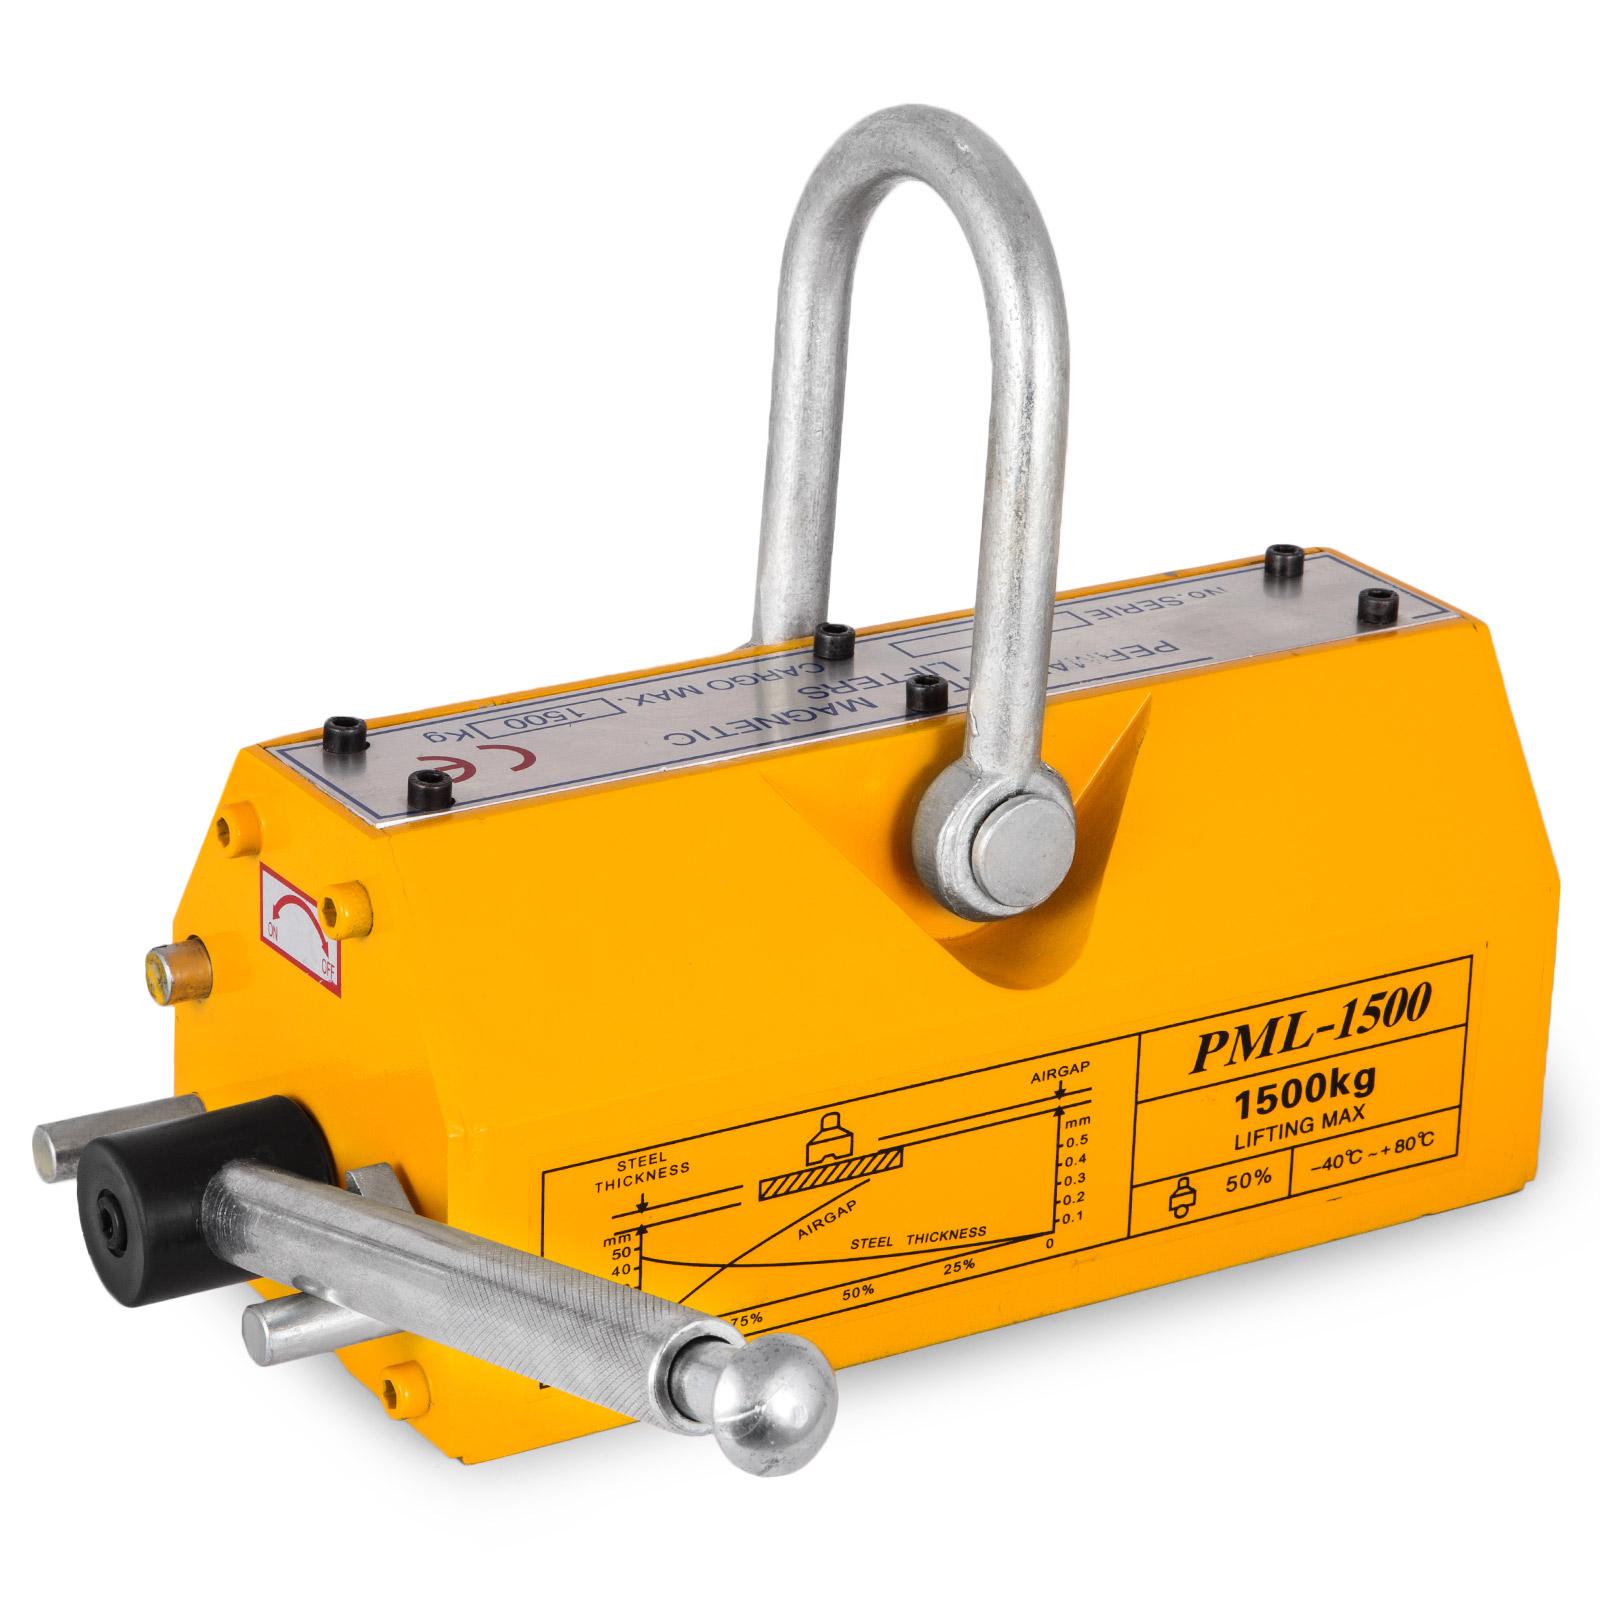 100-300-600-1000KG-Steel-Magnetic-Lifter-Heavy-Duty-Crane-Hoist-Lifting-Magnet miniature 76